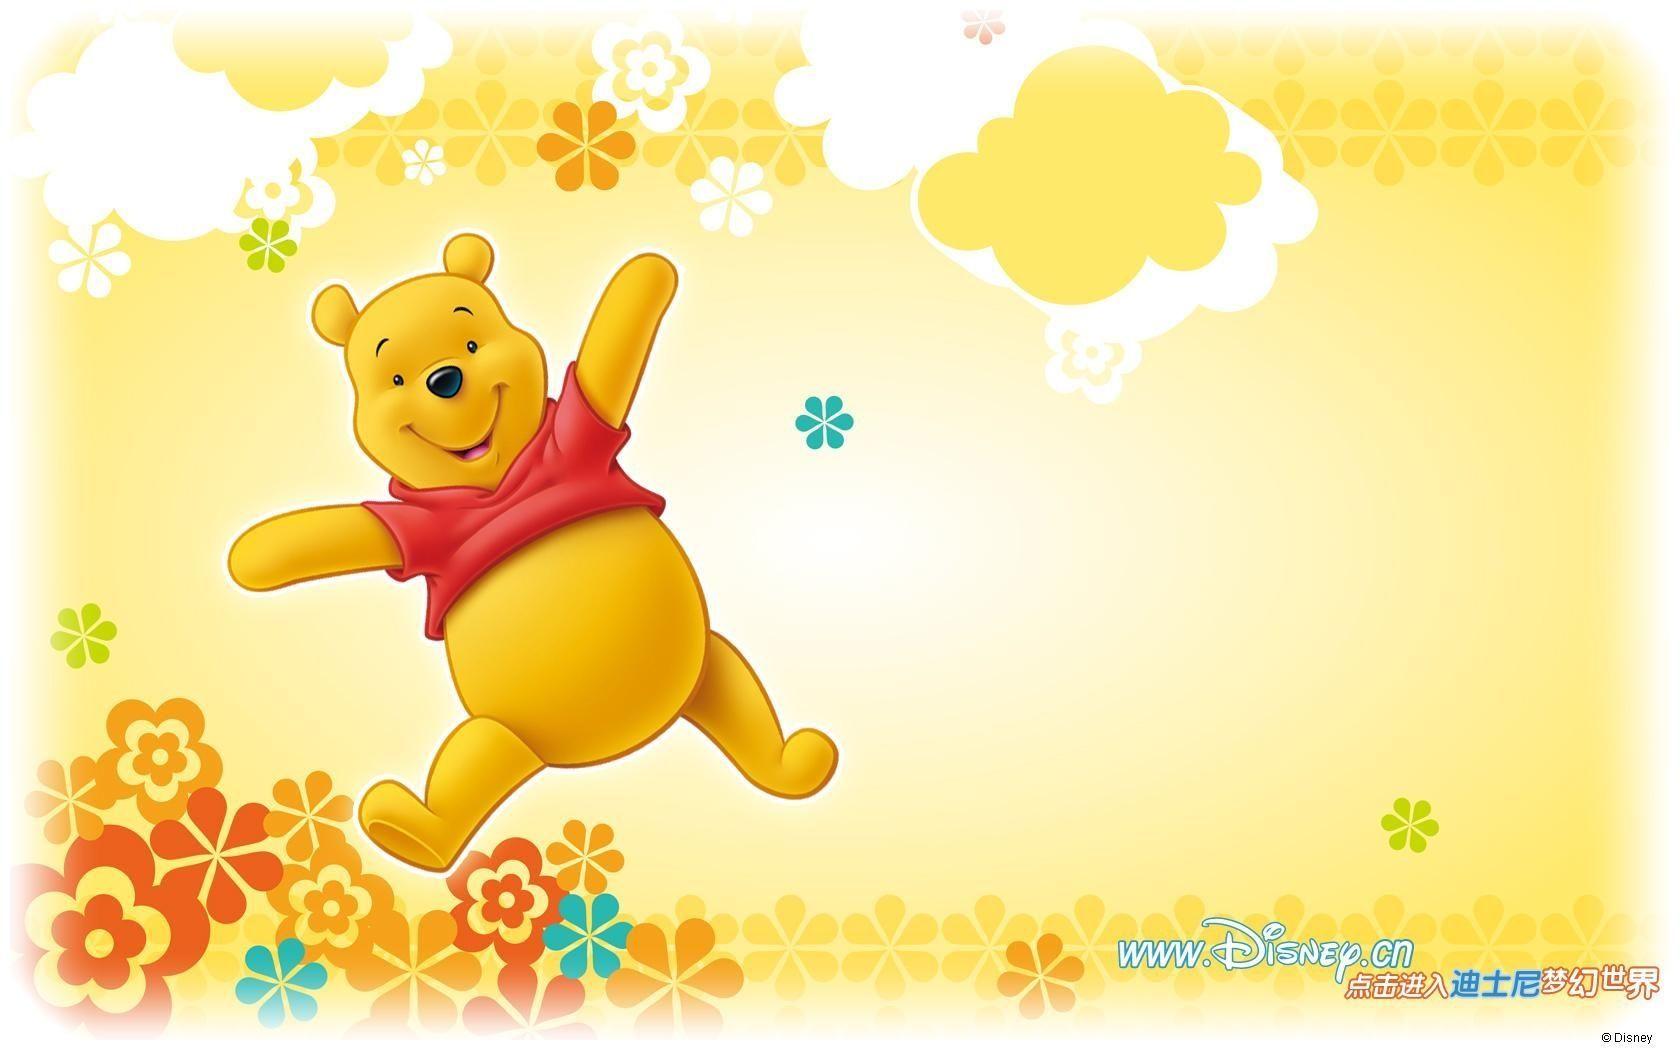 Winnie Pooh Wallpaper In 2019 Winnie The Pooh Background